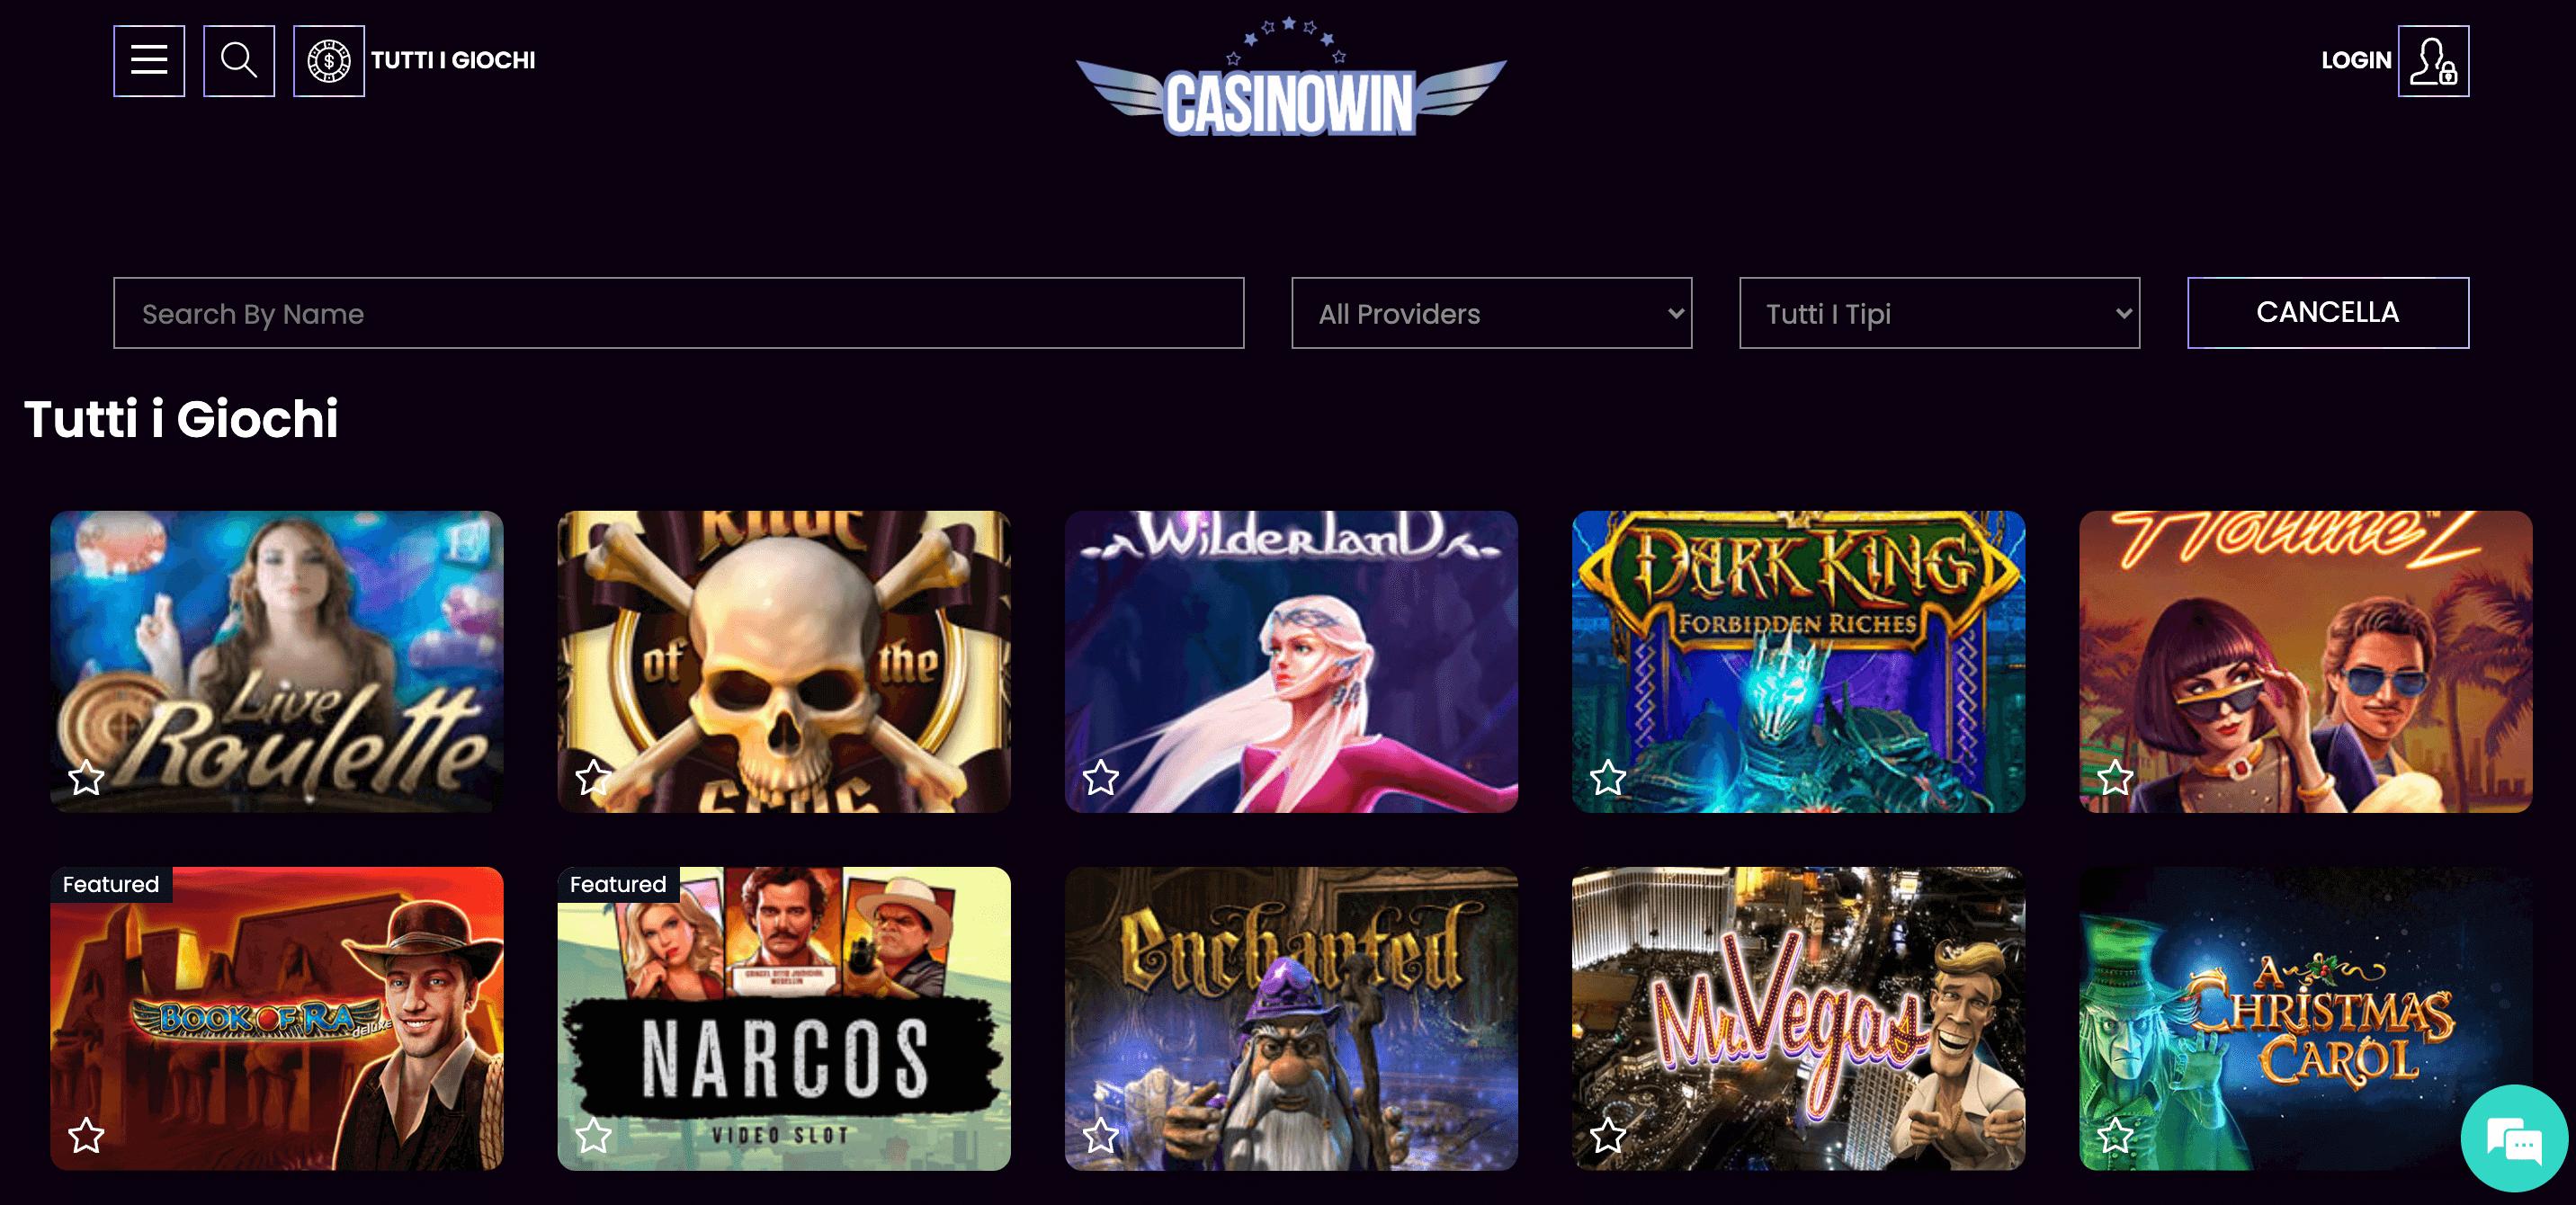 CasinoWin Screenshot